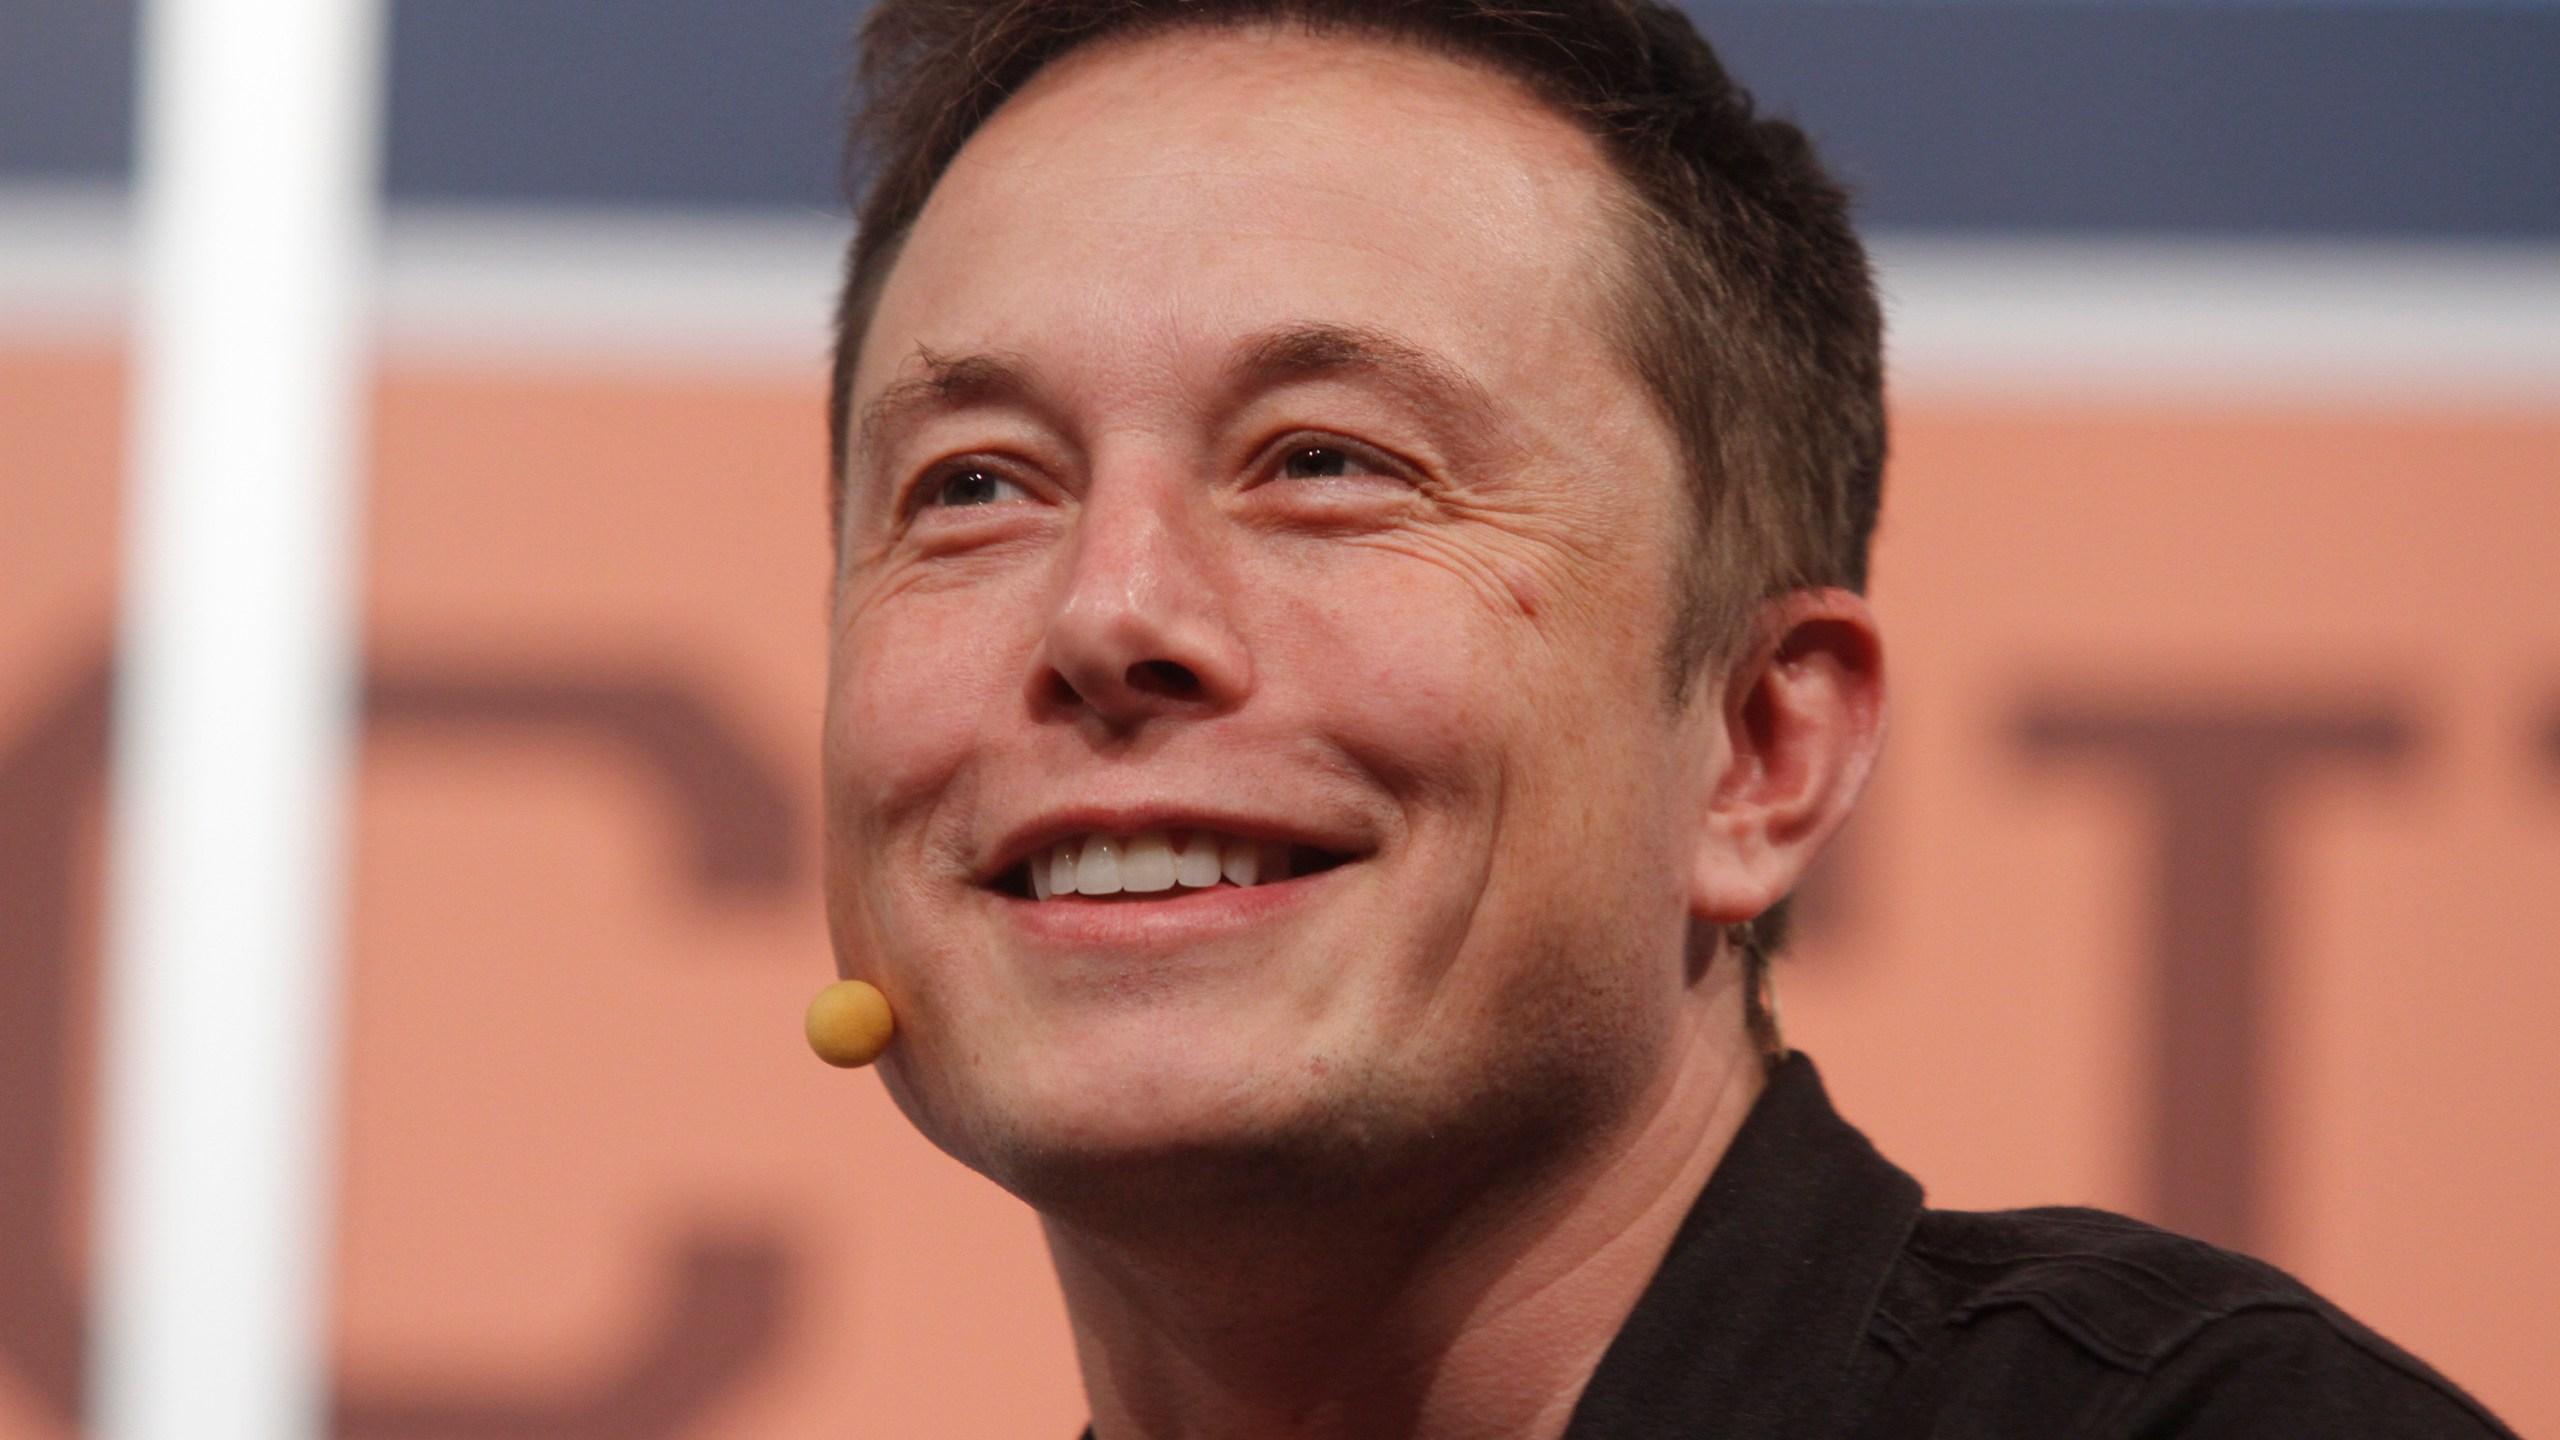 US_Tesla_Musk_88065-159532.jpg20457110